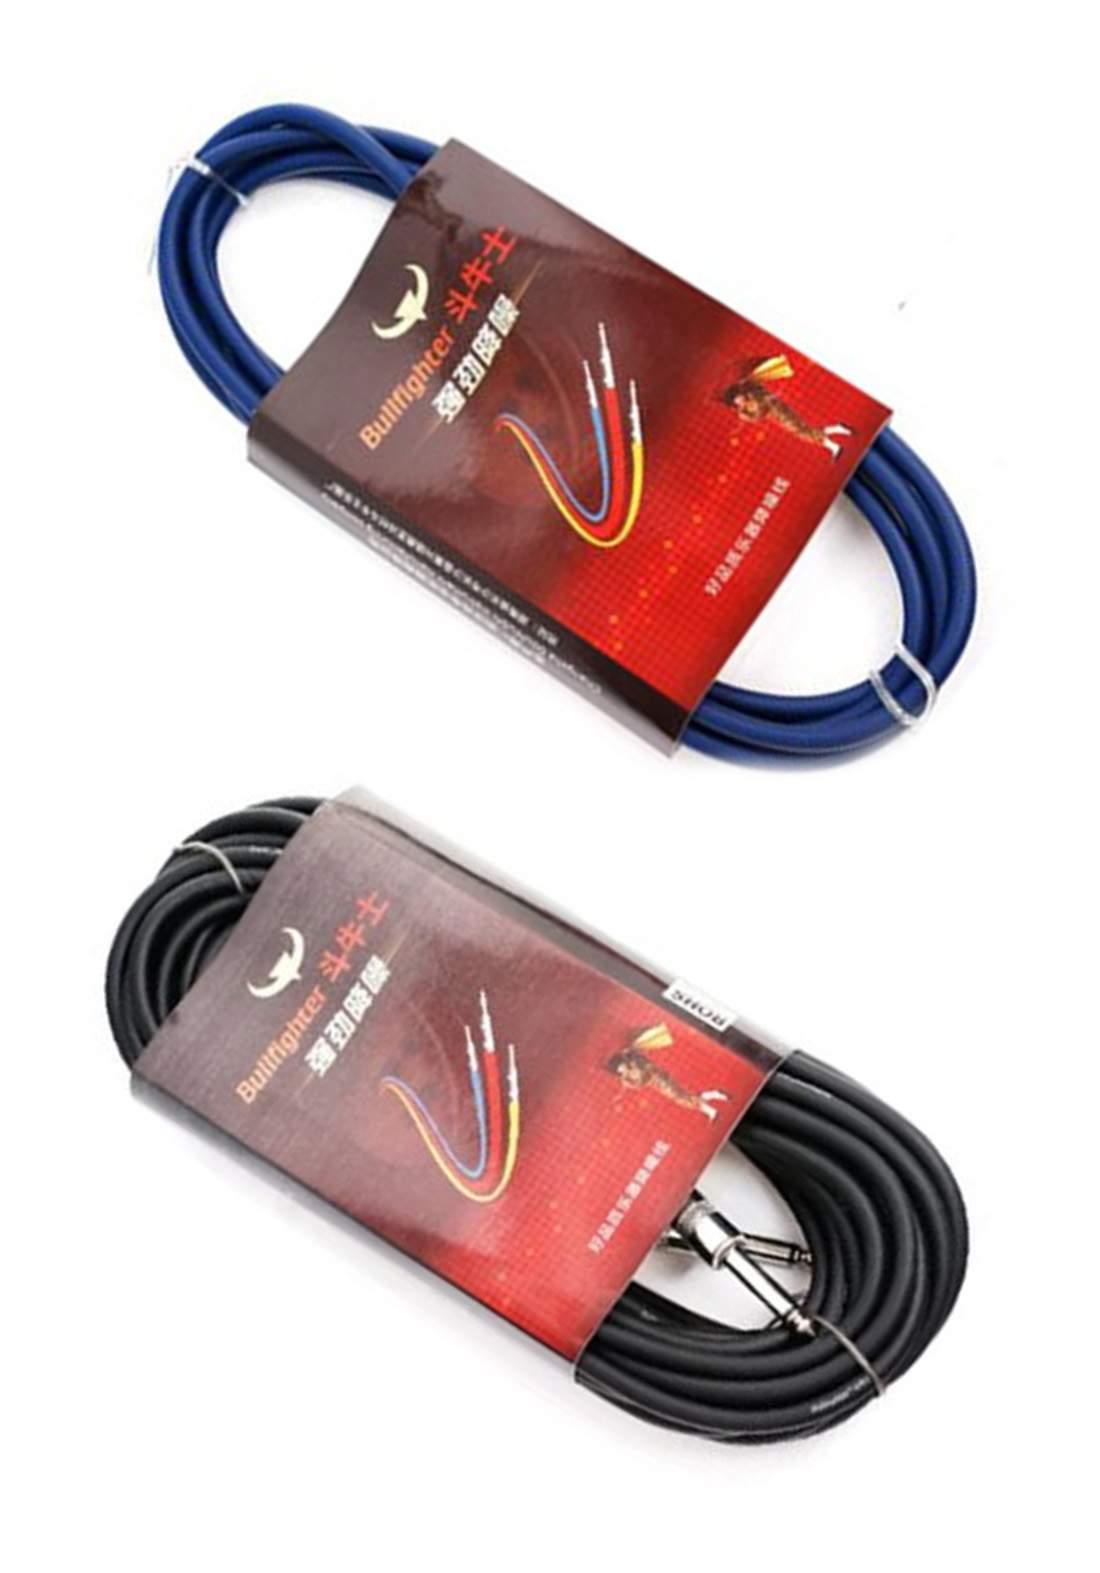 Bullfighter Instrument Cable - كيبل الالات موسيقية